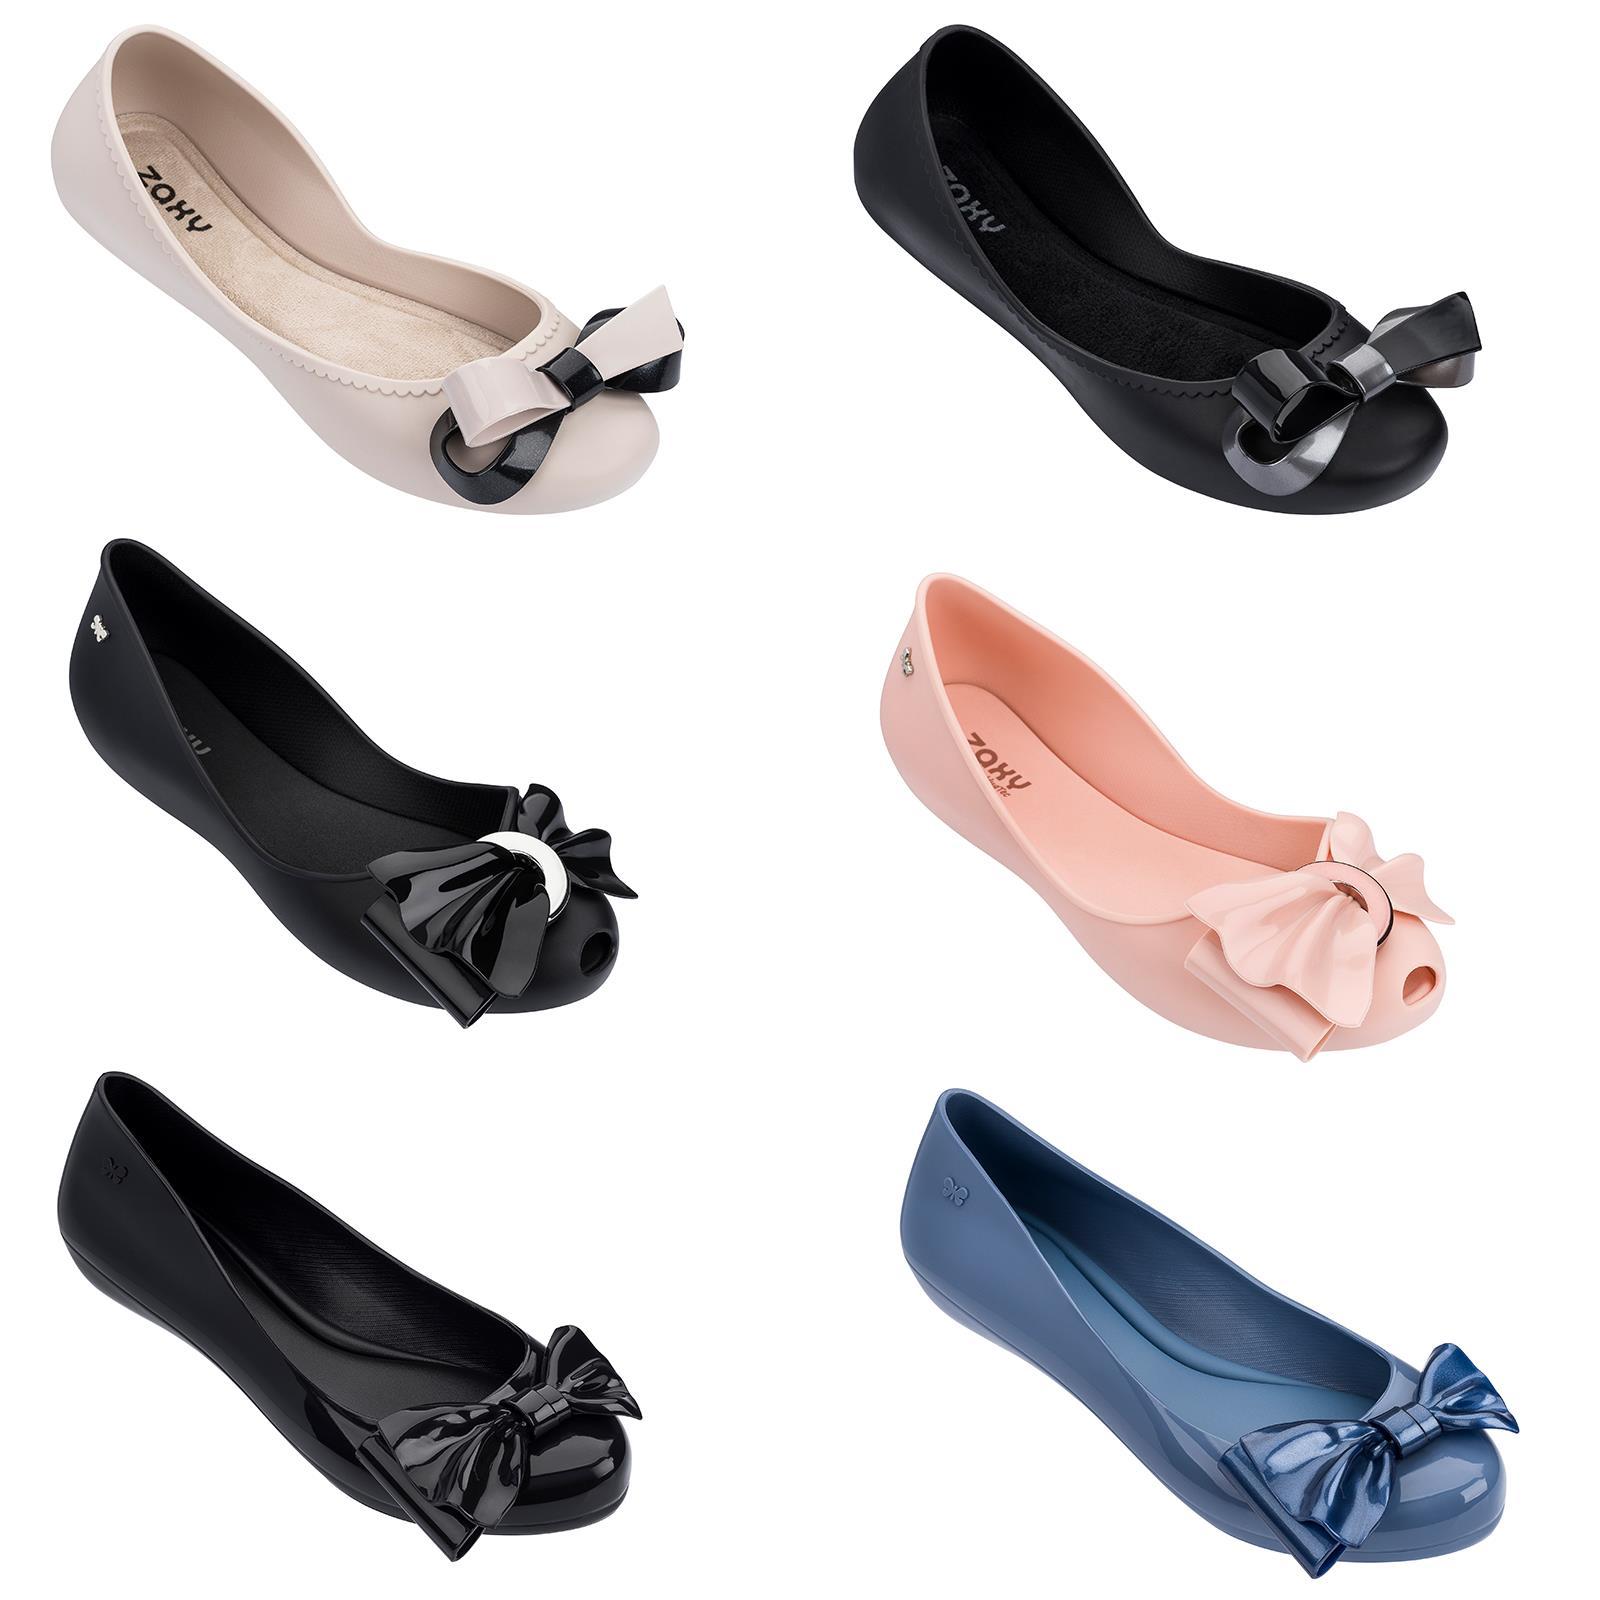 Zaxy Ballerina Slip On Flat Jelly Shoes